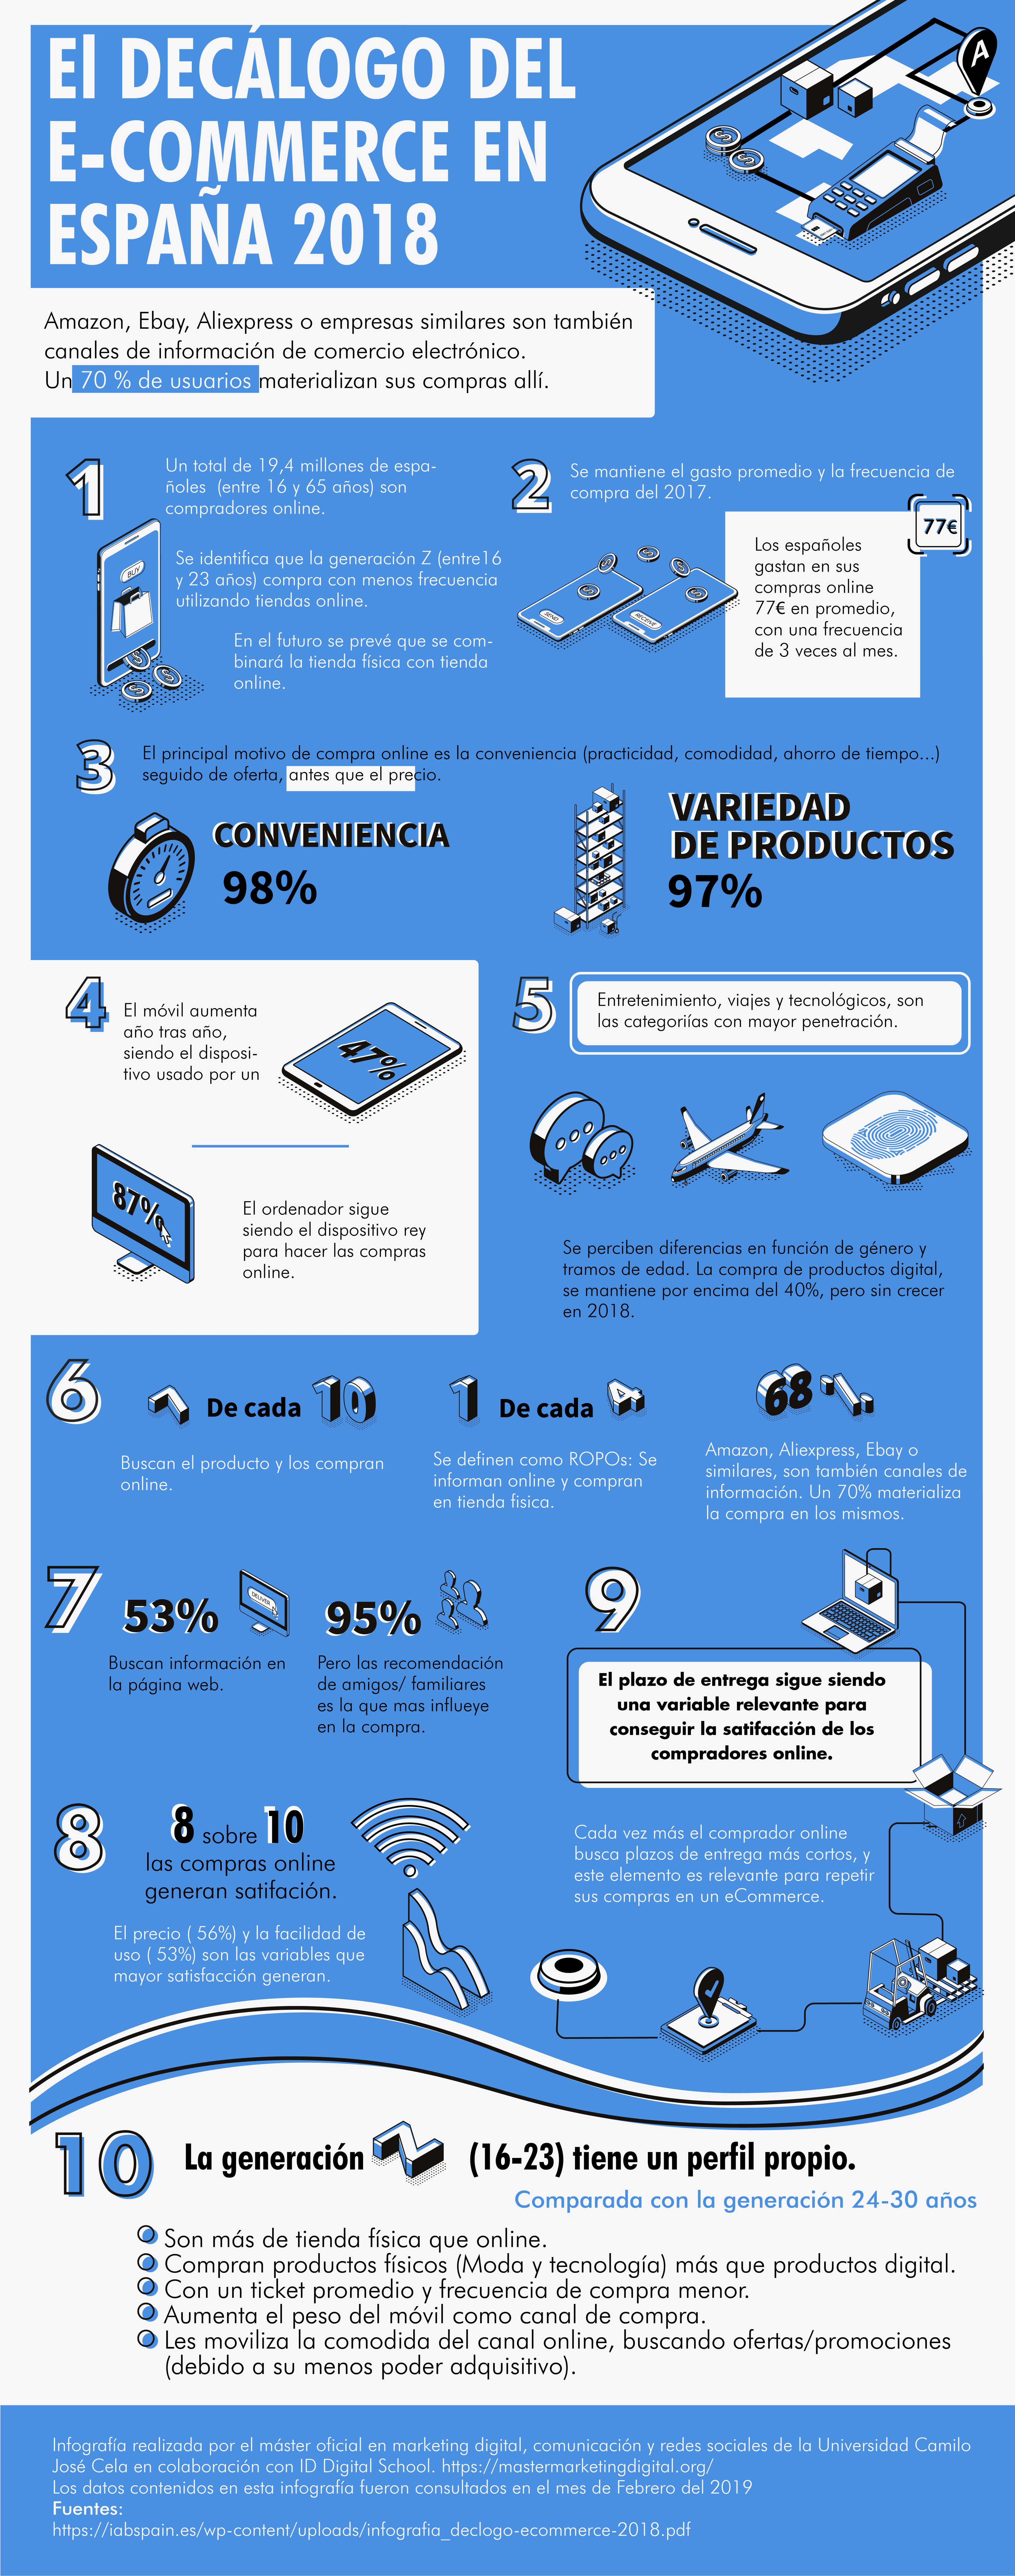 infografia decalogo comercio electronico ecommerce